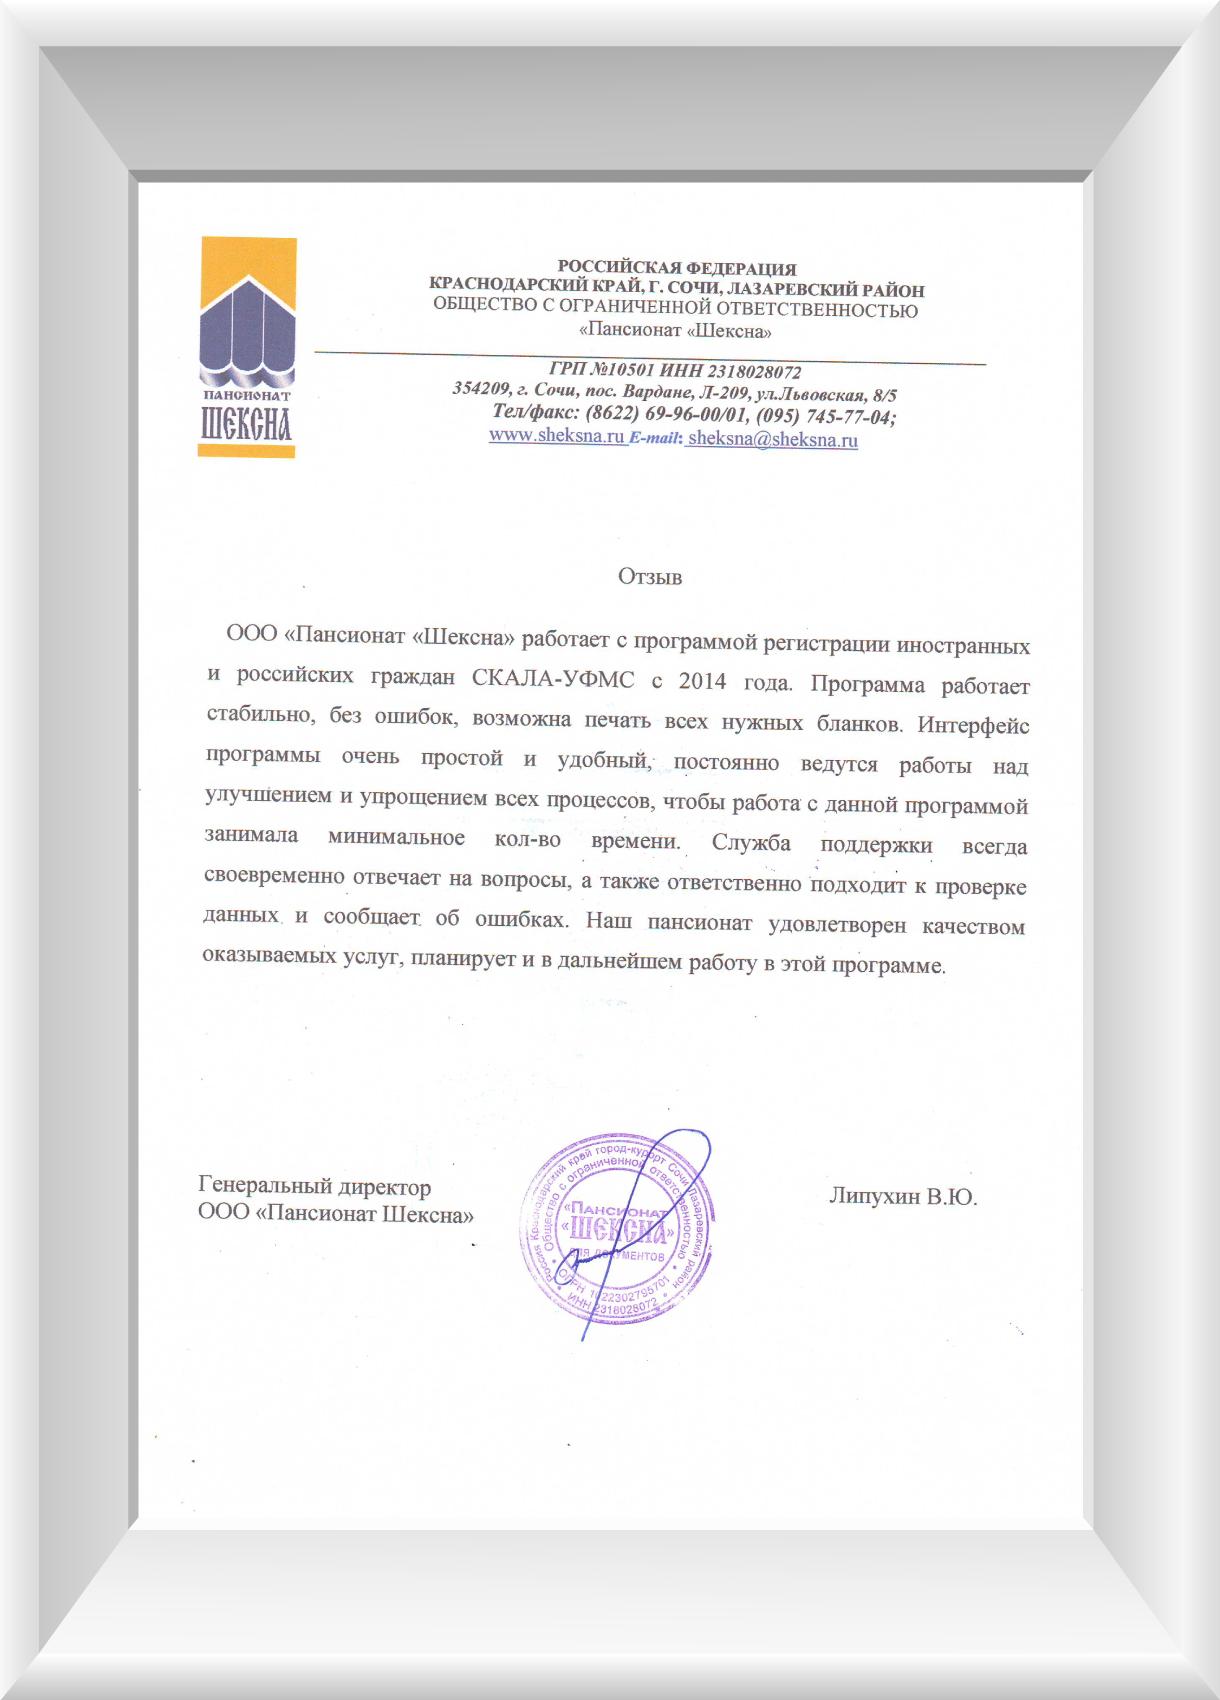 Отзыв о СКАЛА-ЕПГУ Пансионат Шексна